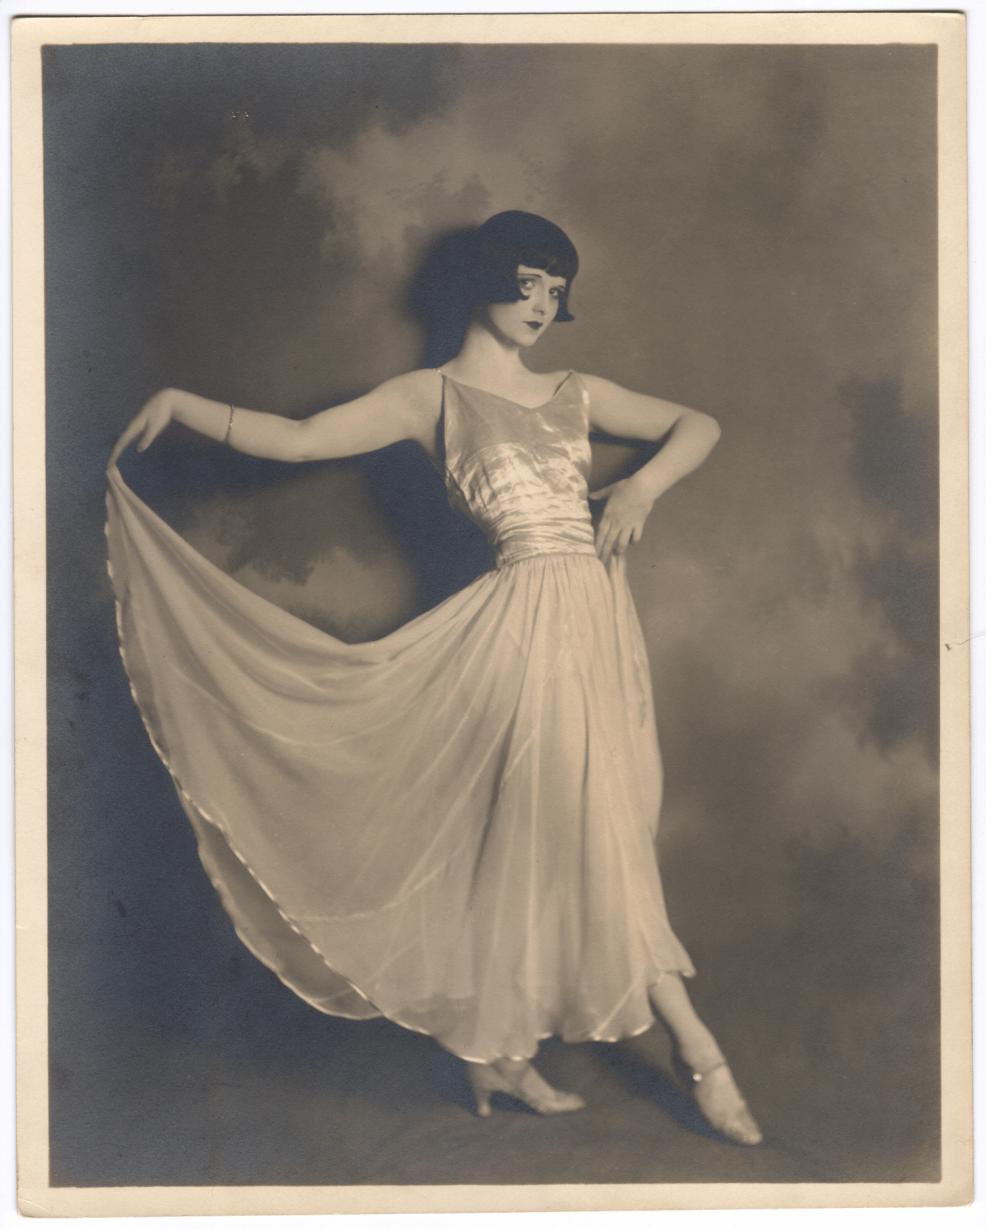 1923 Louise Brooks Dances at Miller Theatre